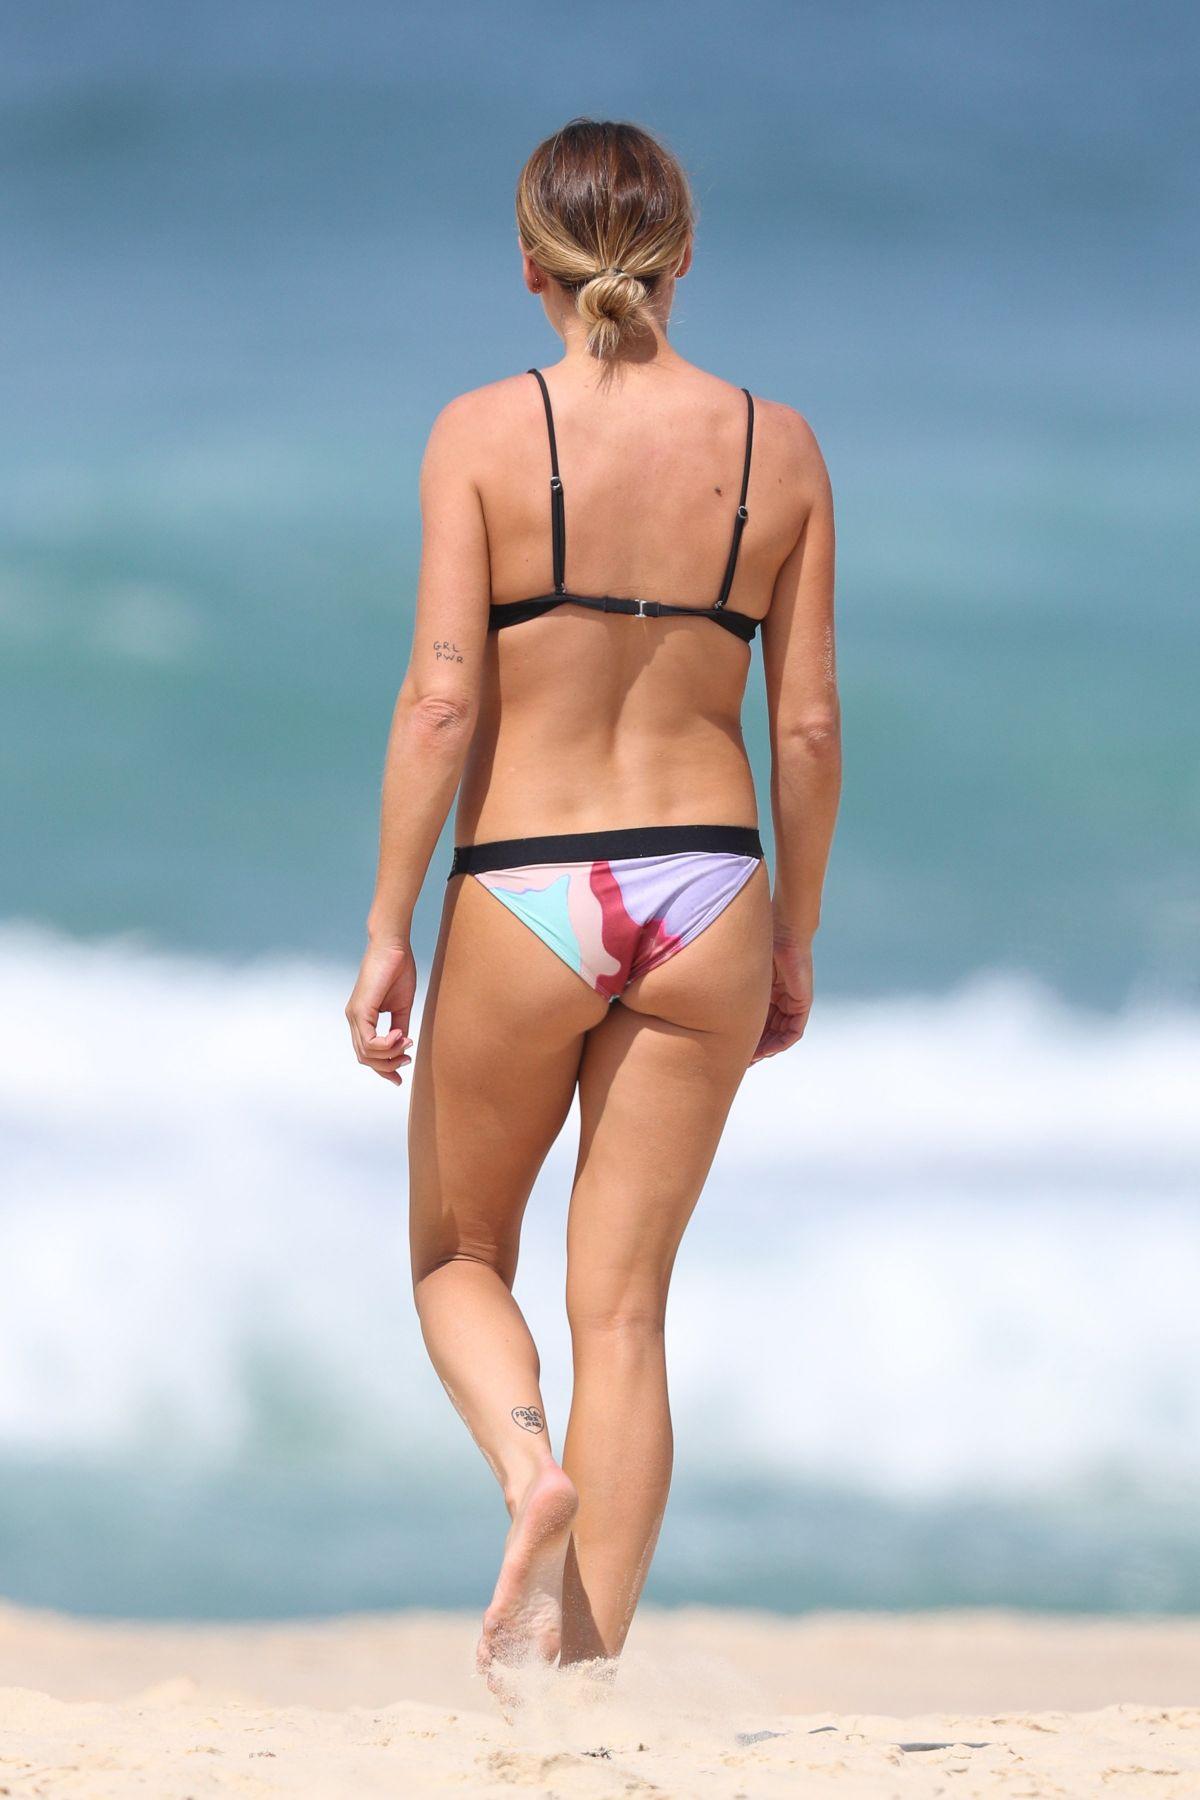 Lisa Clarke in Black Bikini at Tamarama Beach in Sydney Pic 20 of 35